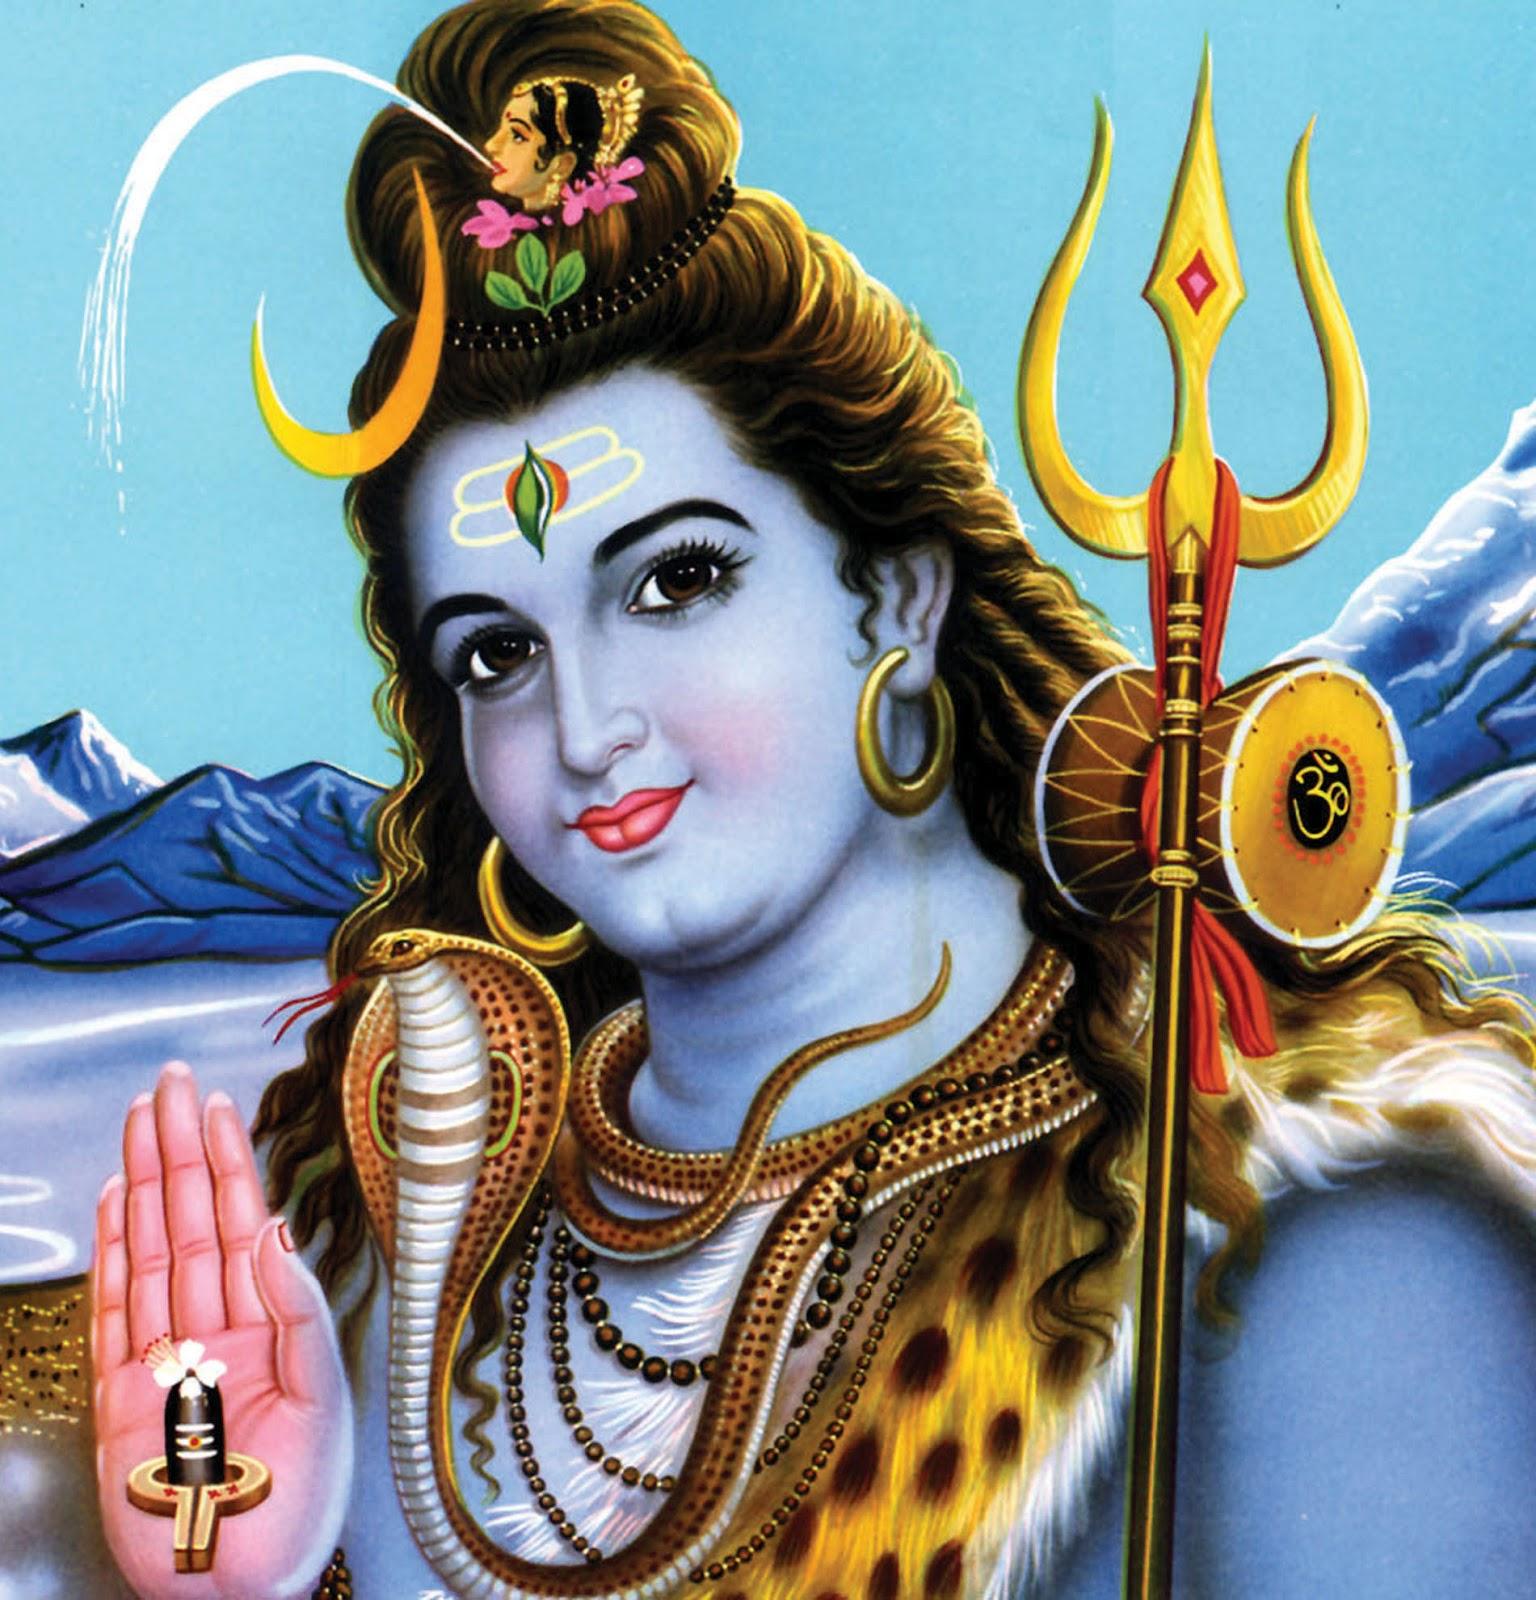 Shiva God Images free download